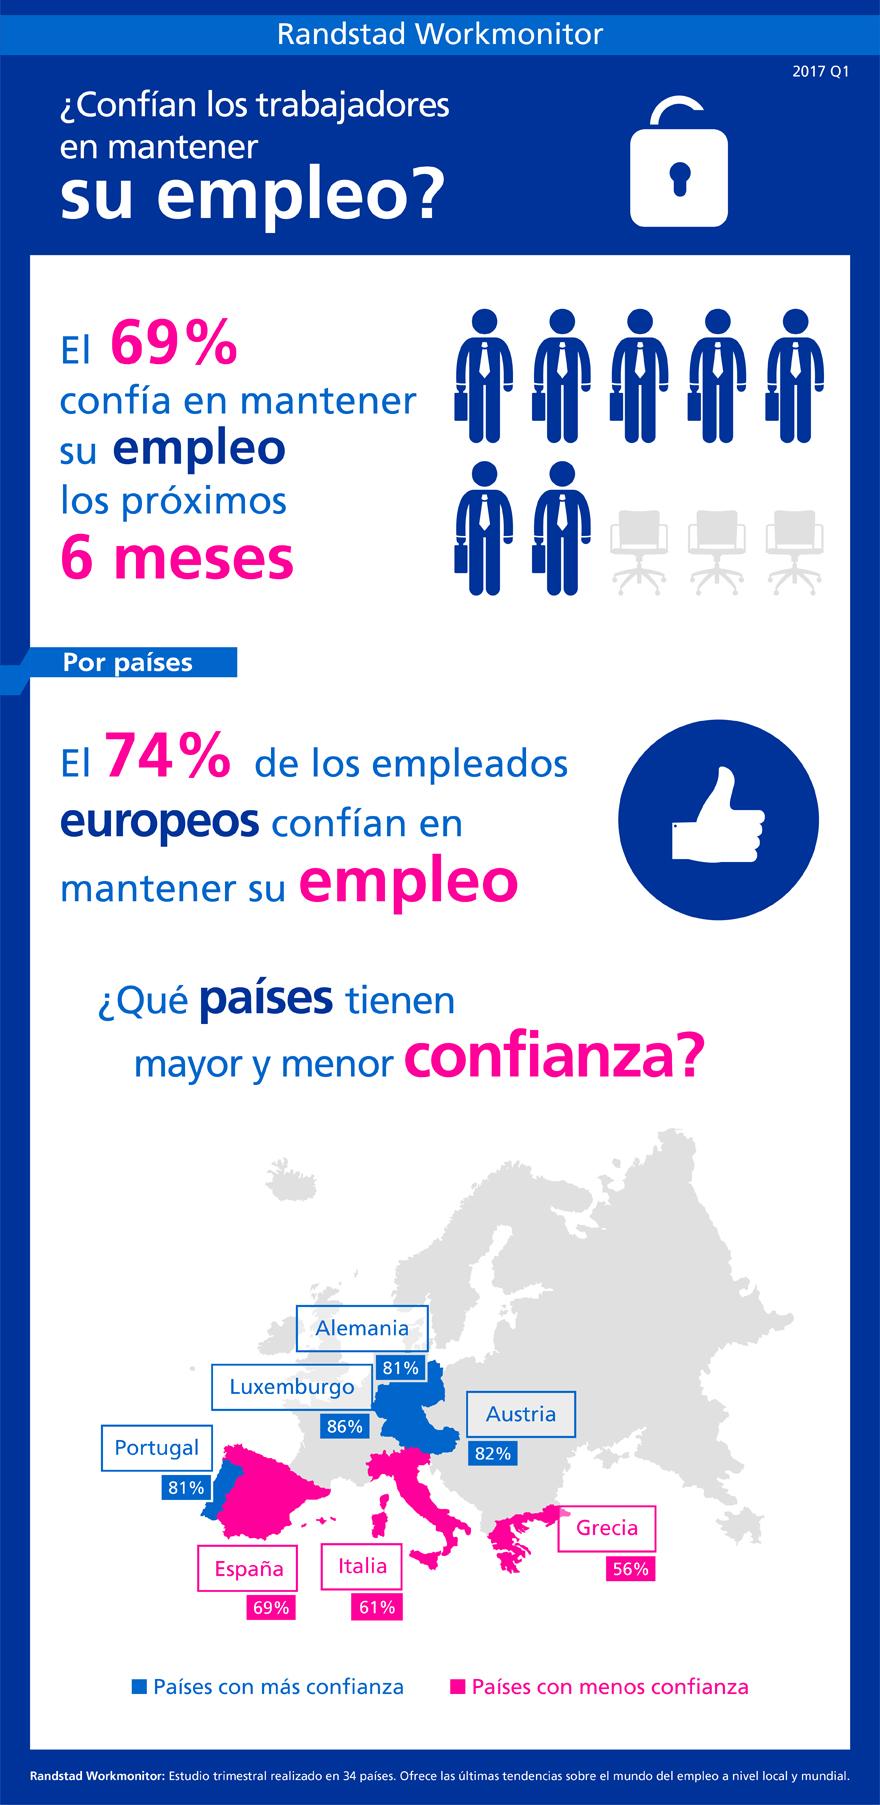 infografía Confianza en mantener el empleo Q1 2017 | randstad workmonitor